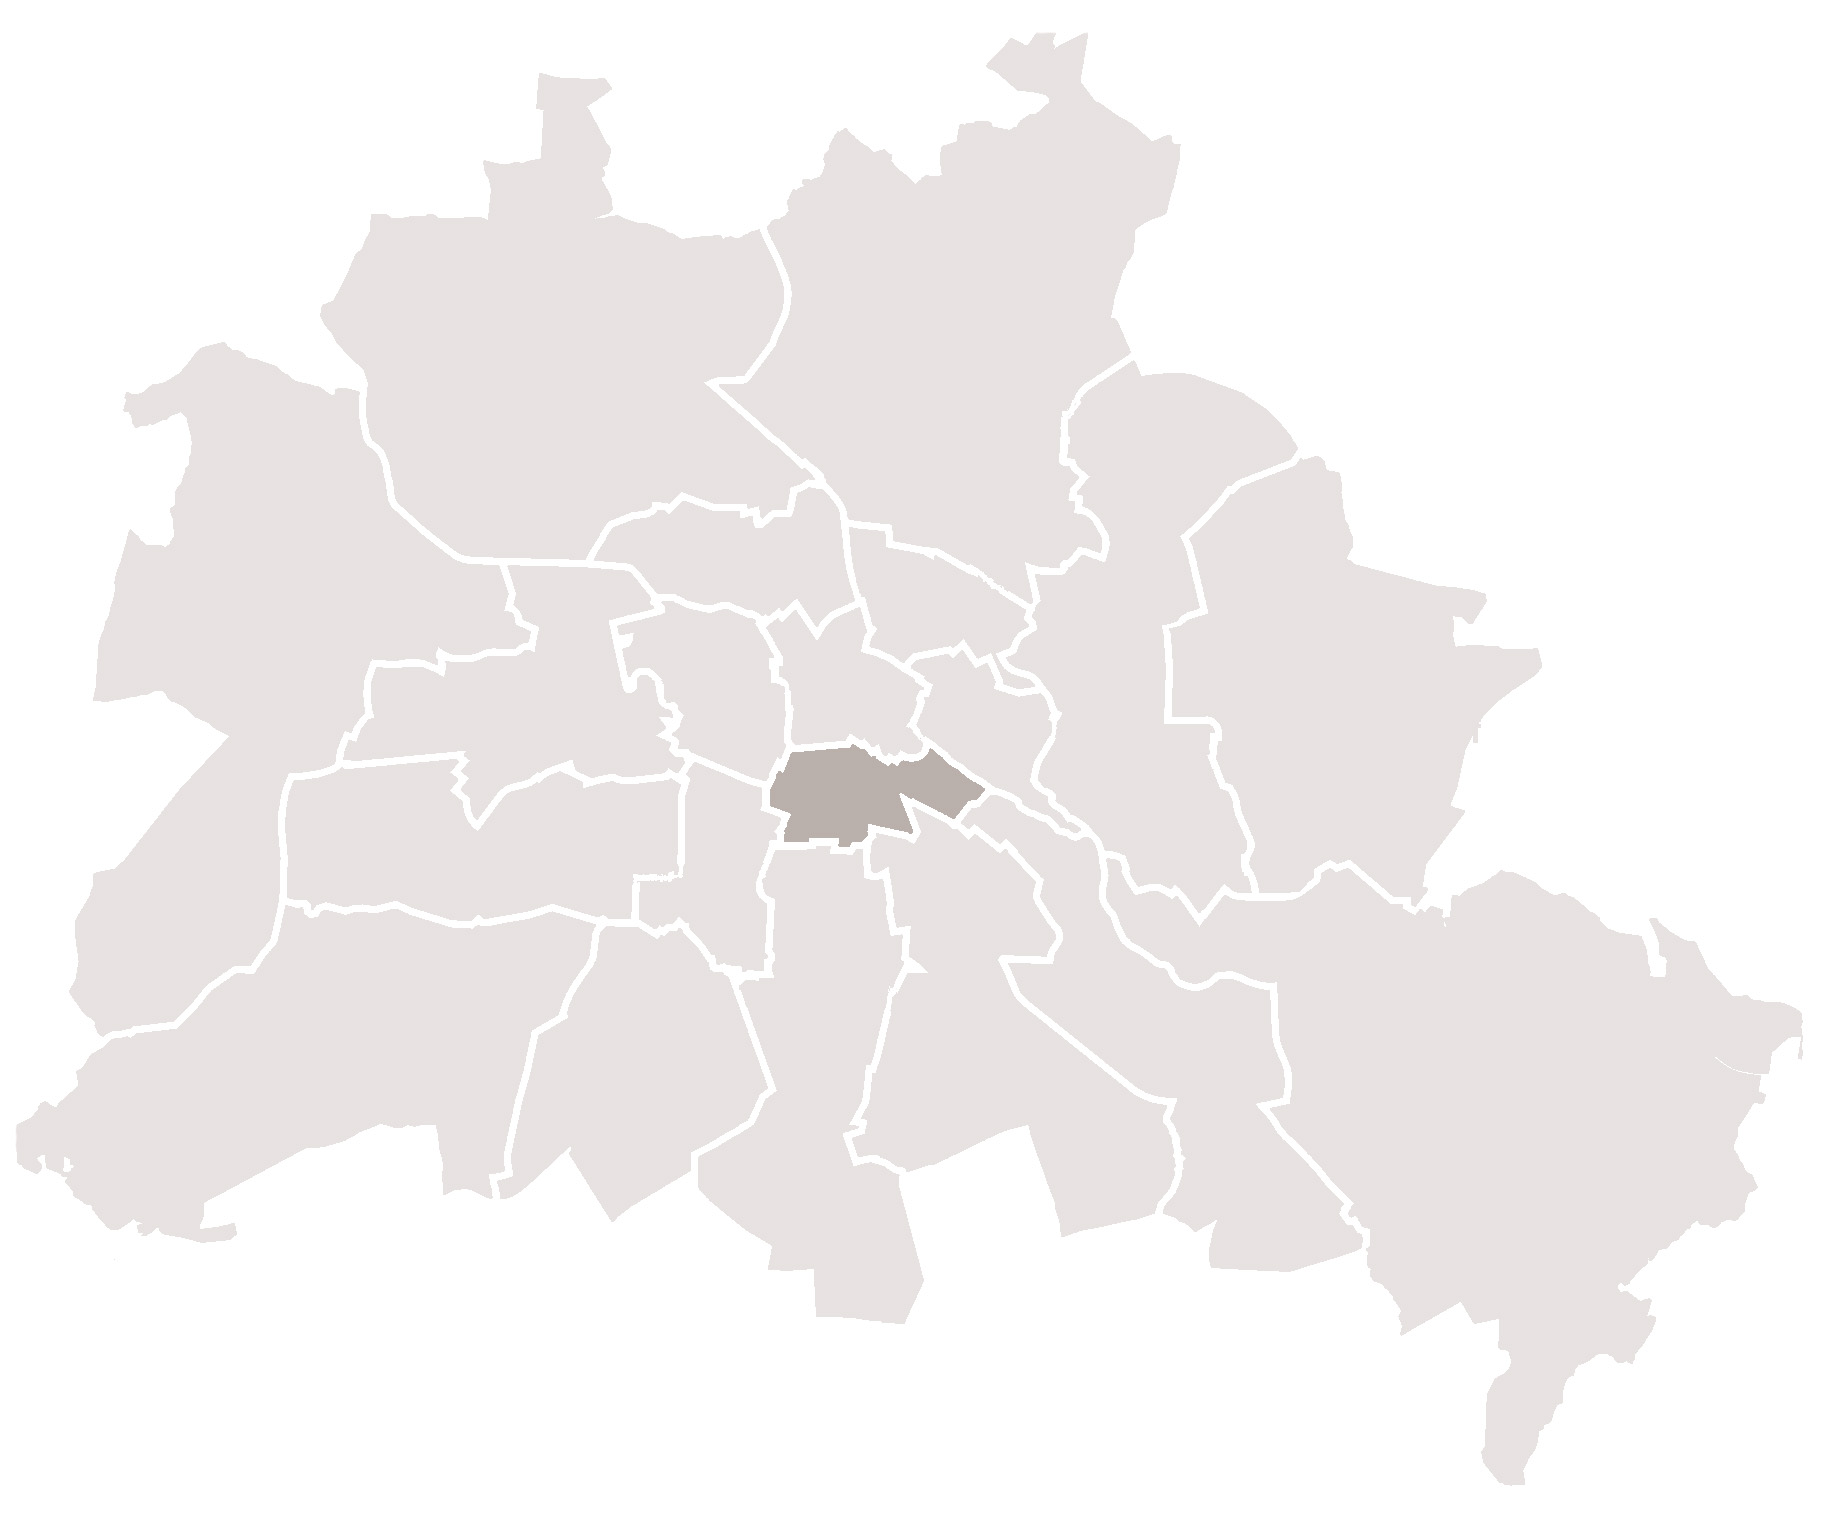 Karte Berlin Kreuzberg